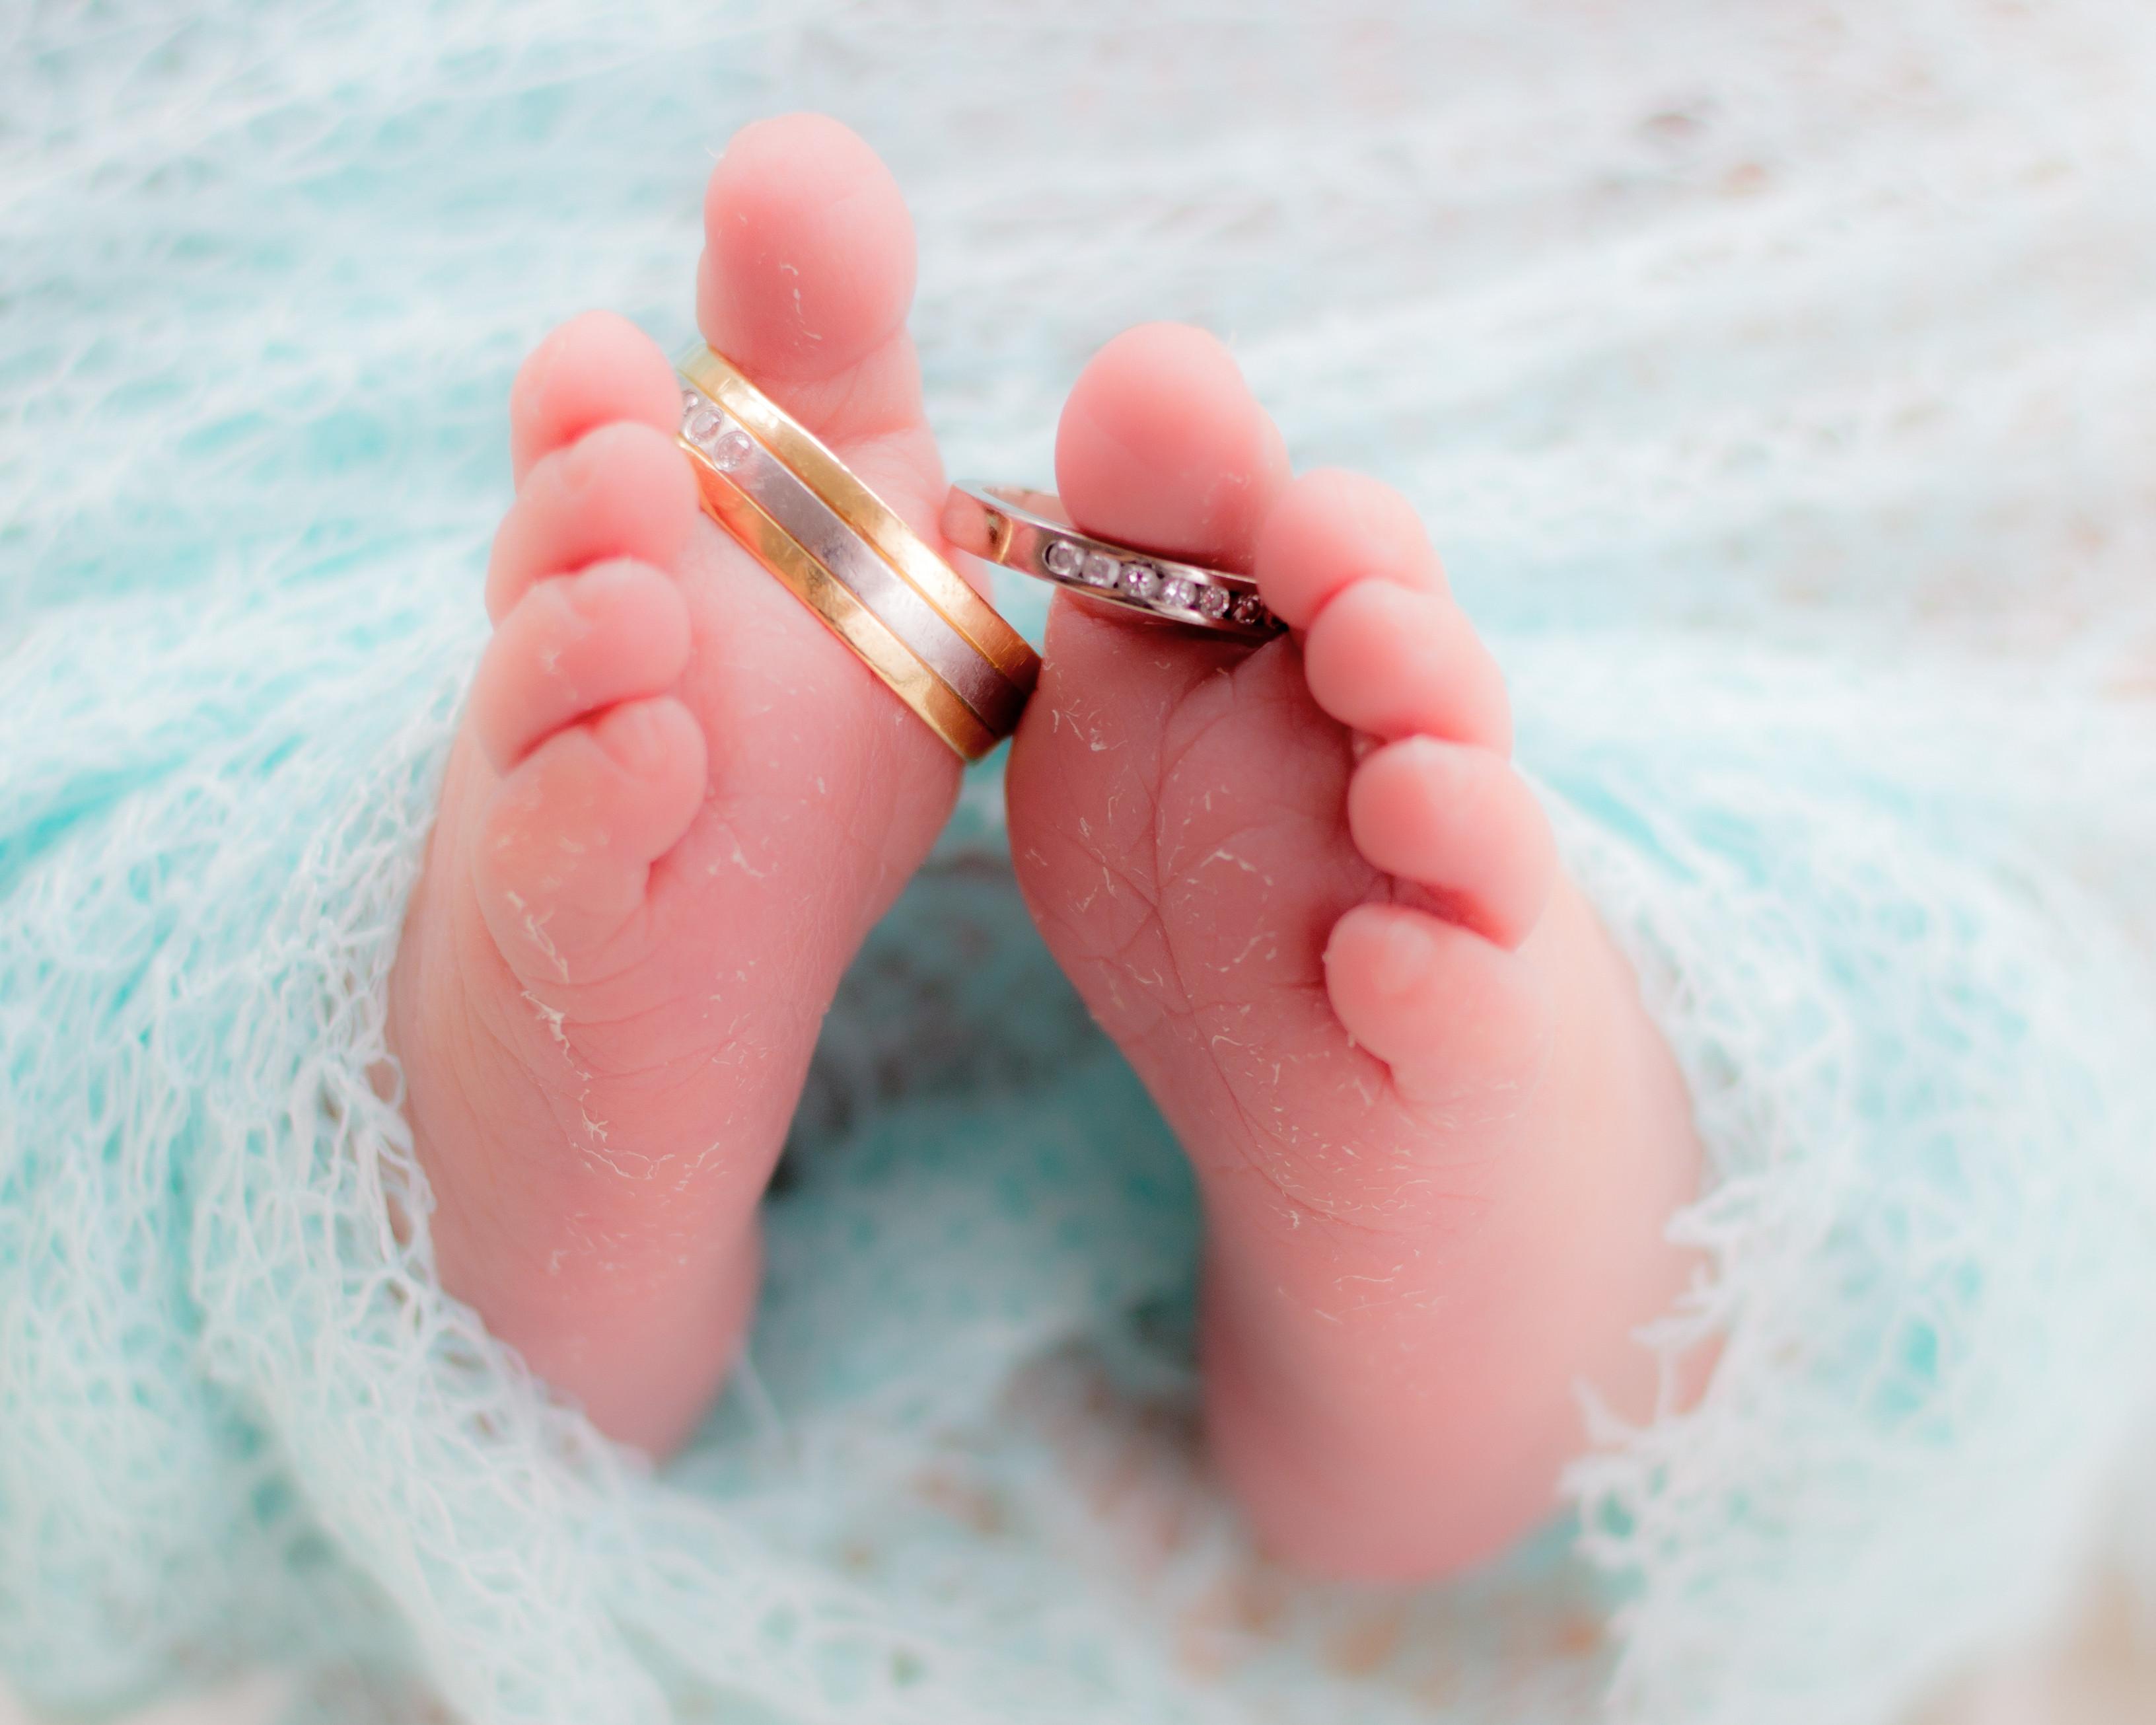 Deposit for newborn